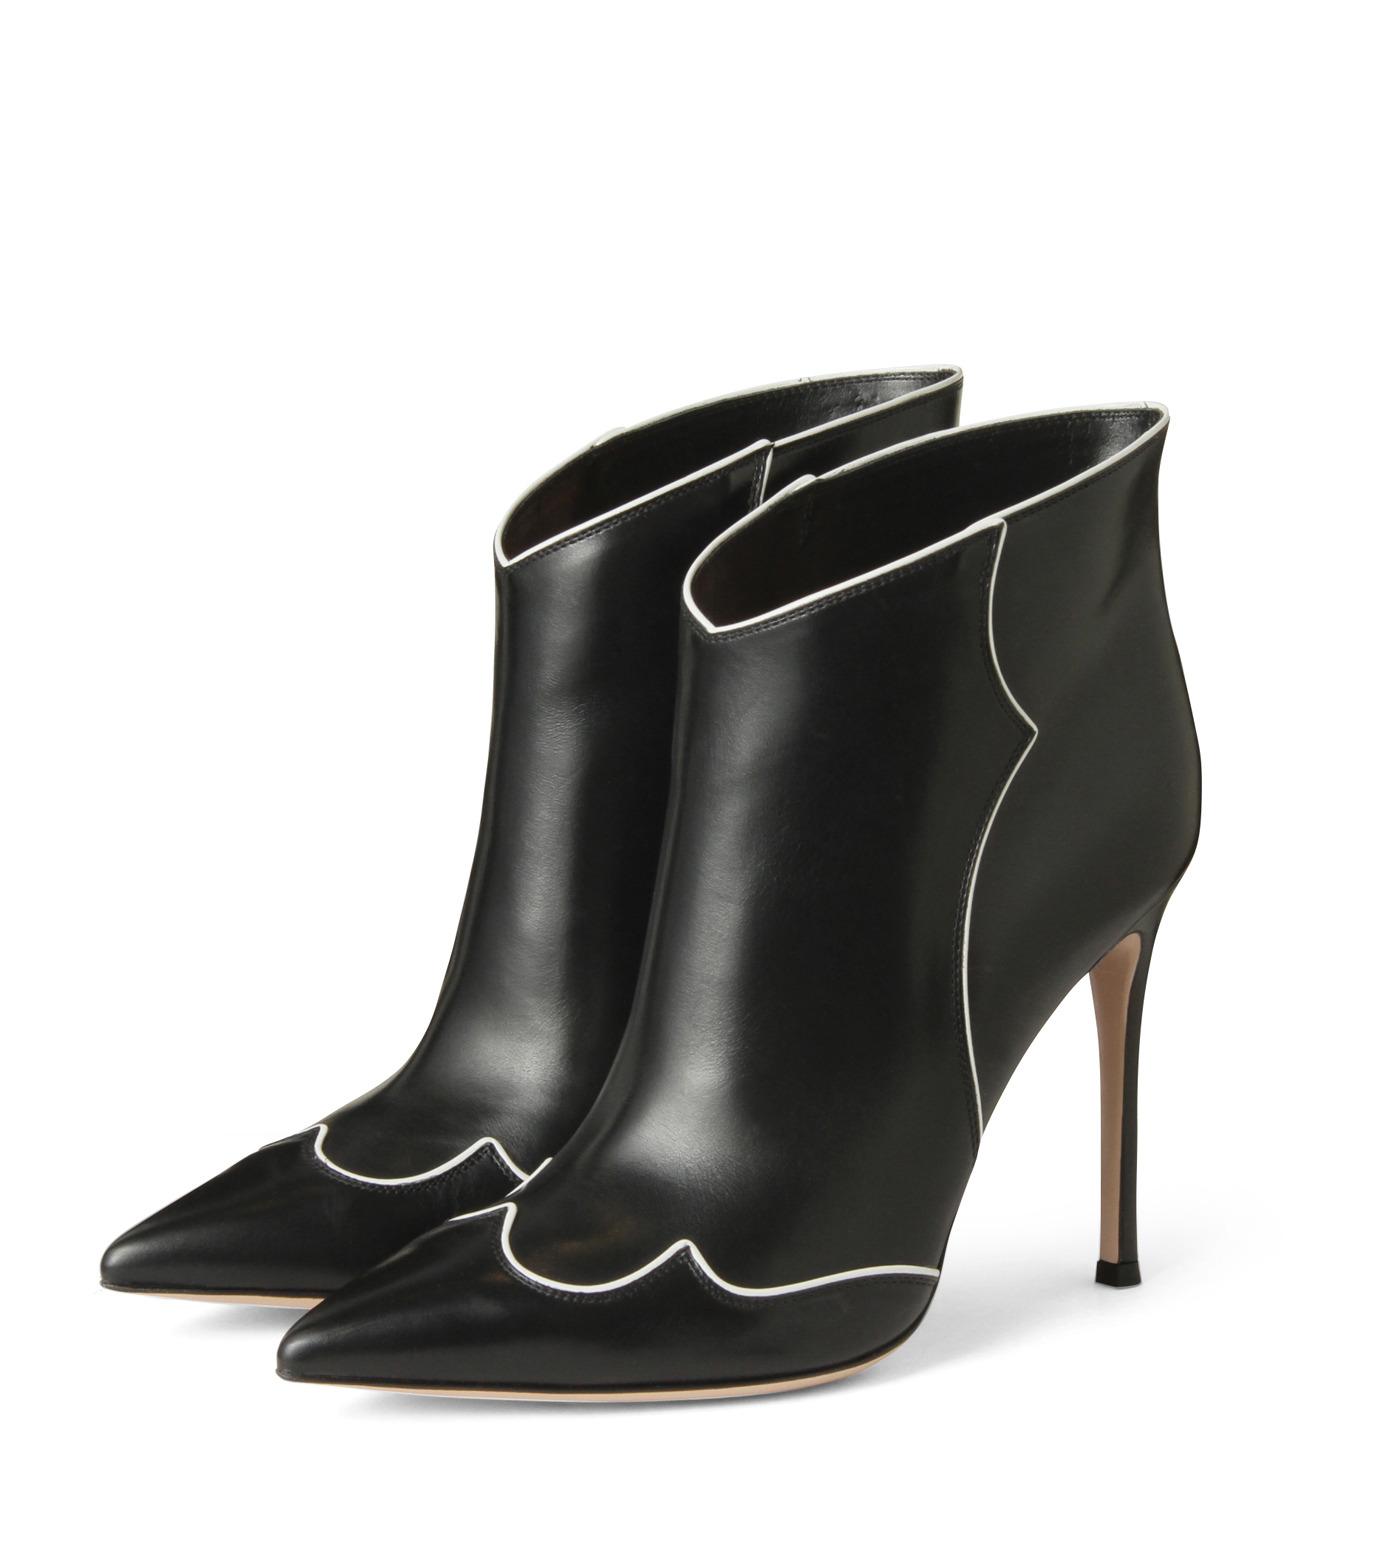 Gianvito Rossi(ジャンヴィト ロッシ)のWestern Stitch Bootie-BLACK(シューズ/shoes)-GQ05936-13 拡大詳細画像3